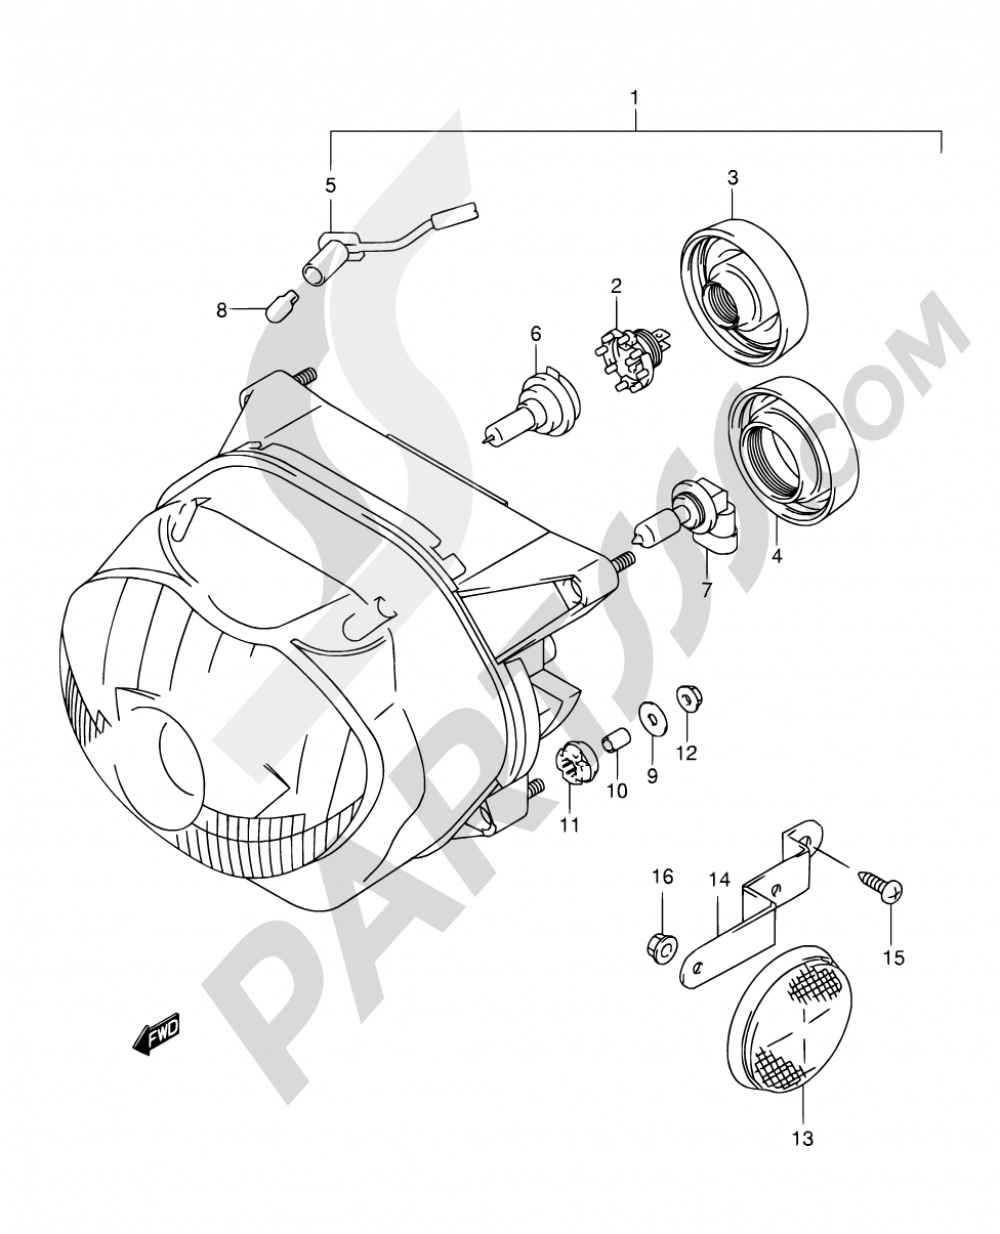 25C - HEADLAMP (MODEL Y/K1 E04,E17,E18,E22,E25,E34,E54,P09,P37) Suzuki FREEWIND XF650 2001